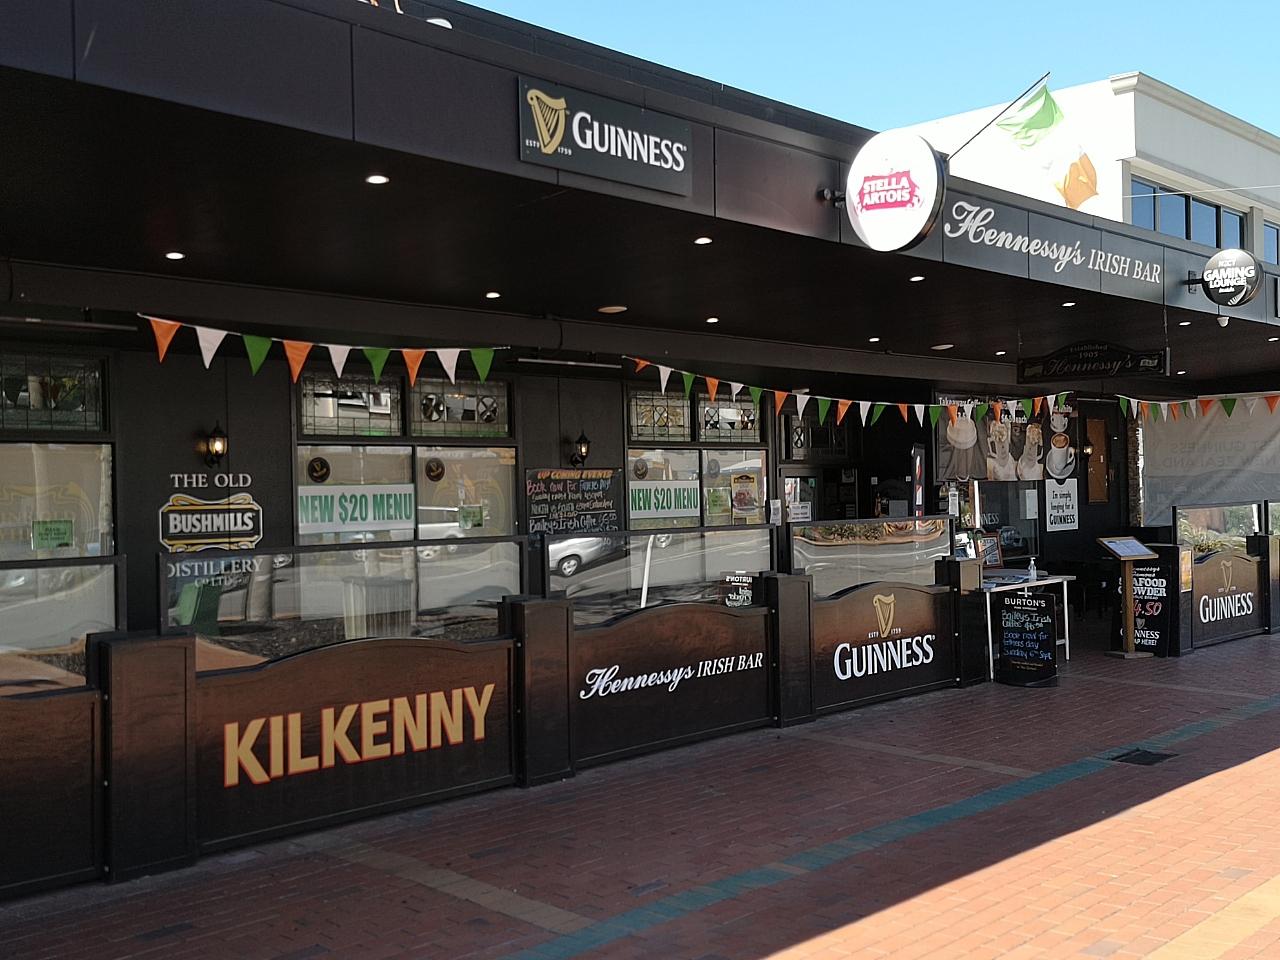 Hennessy's Irish Bar